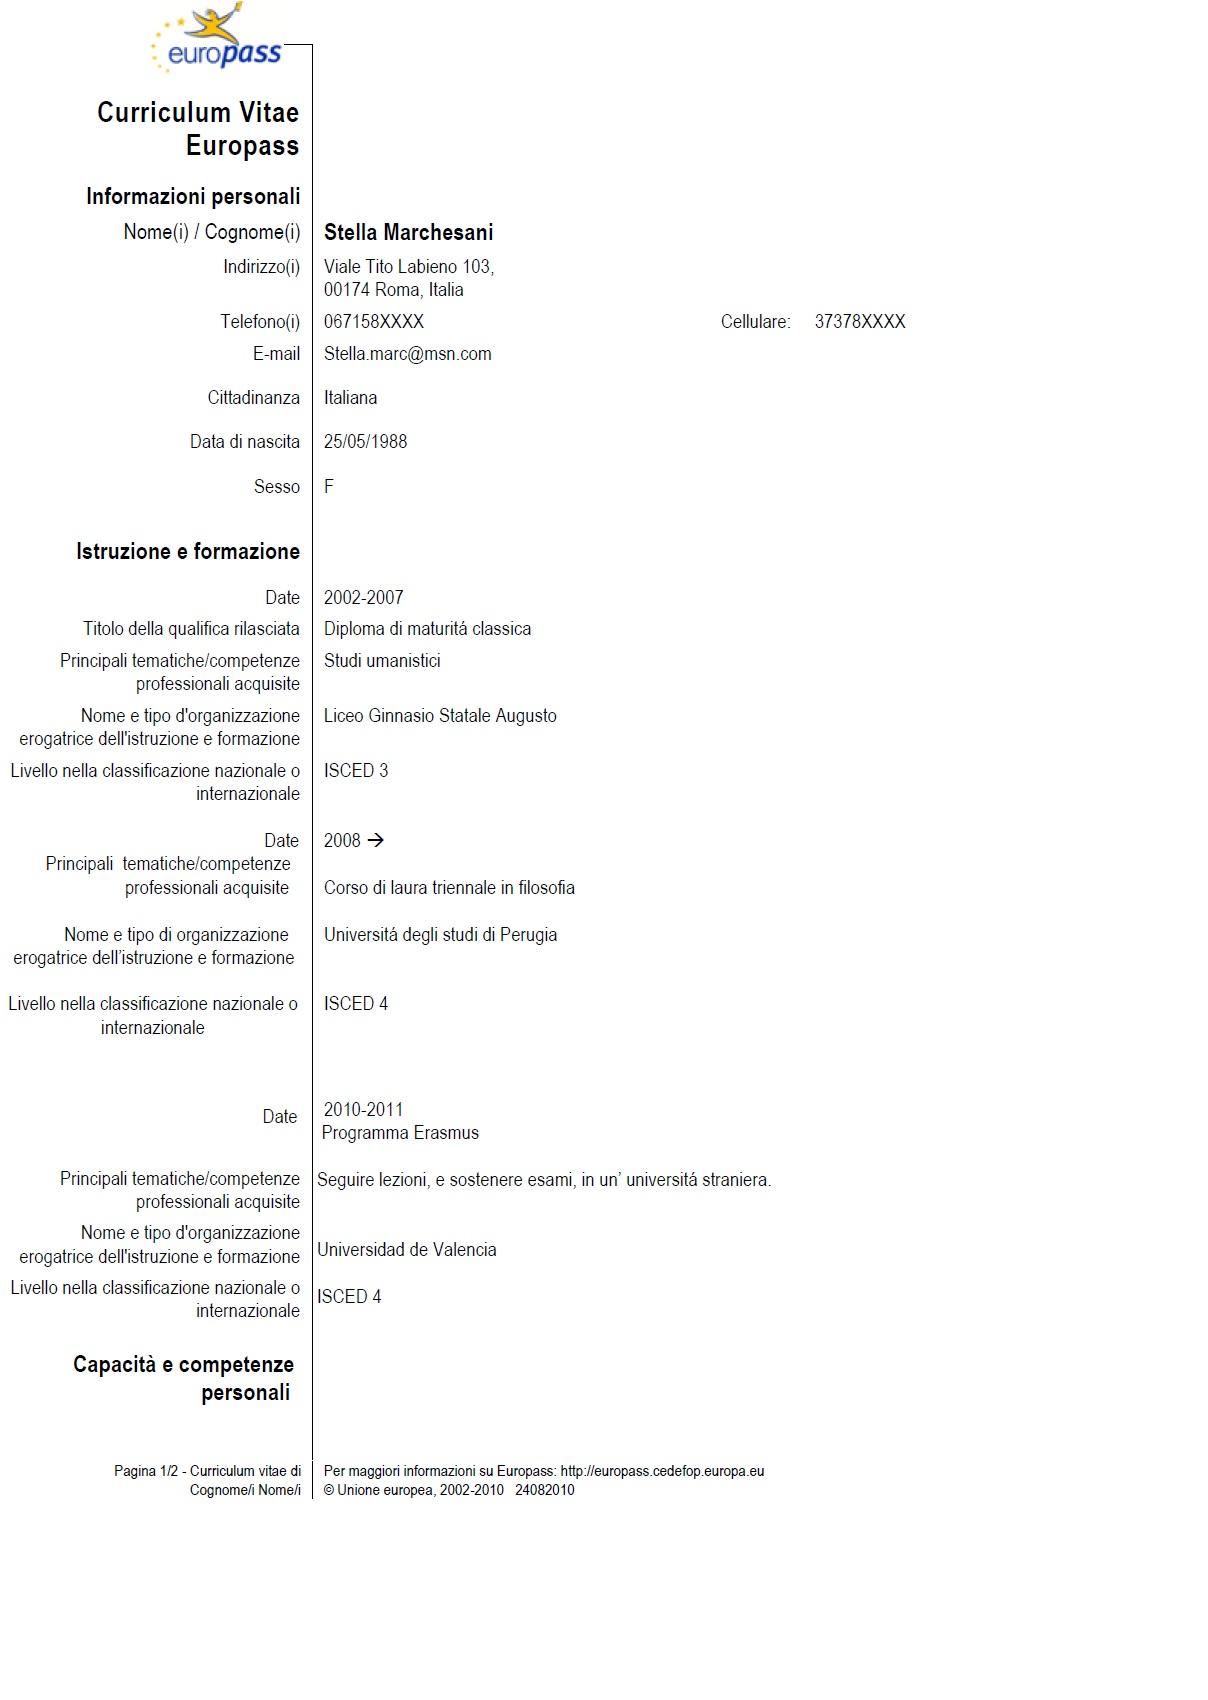 Modello curriculum vitae formato europeo